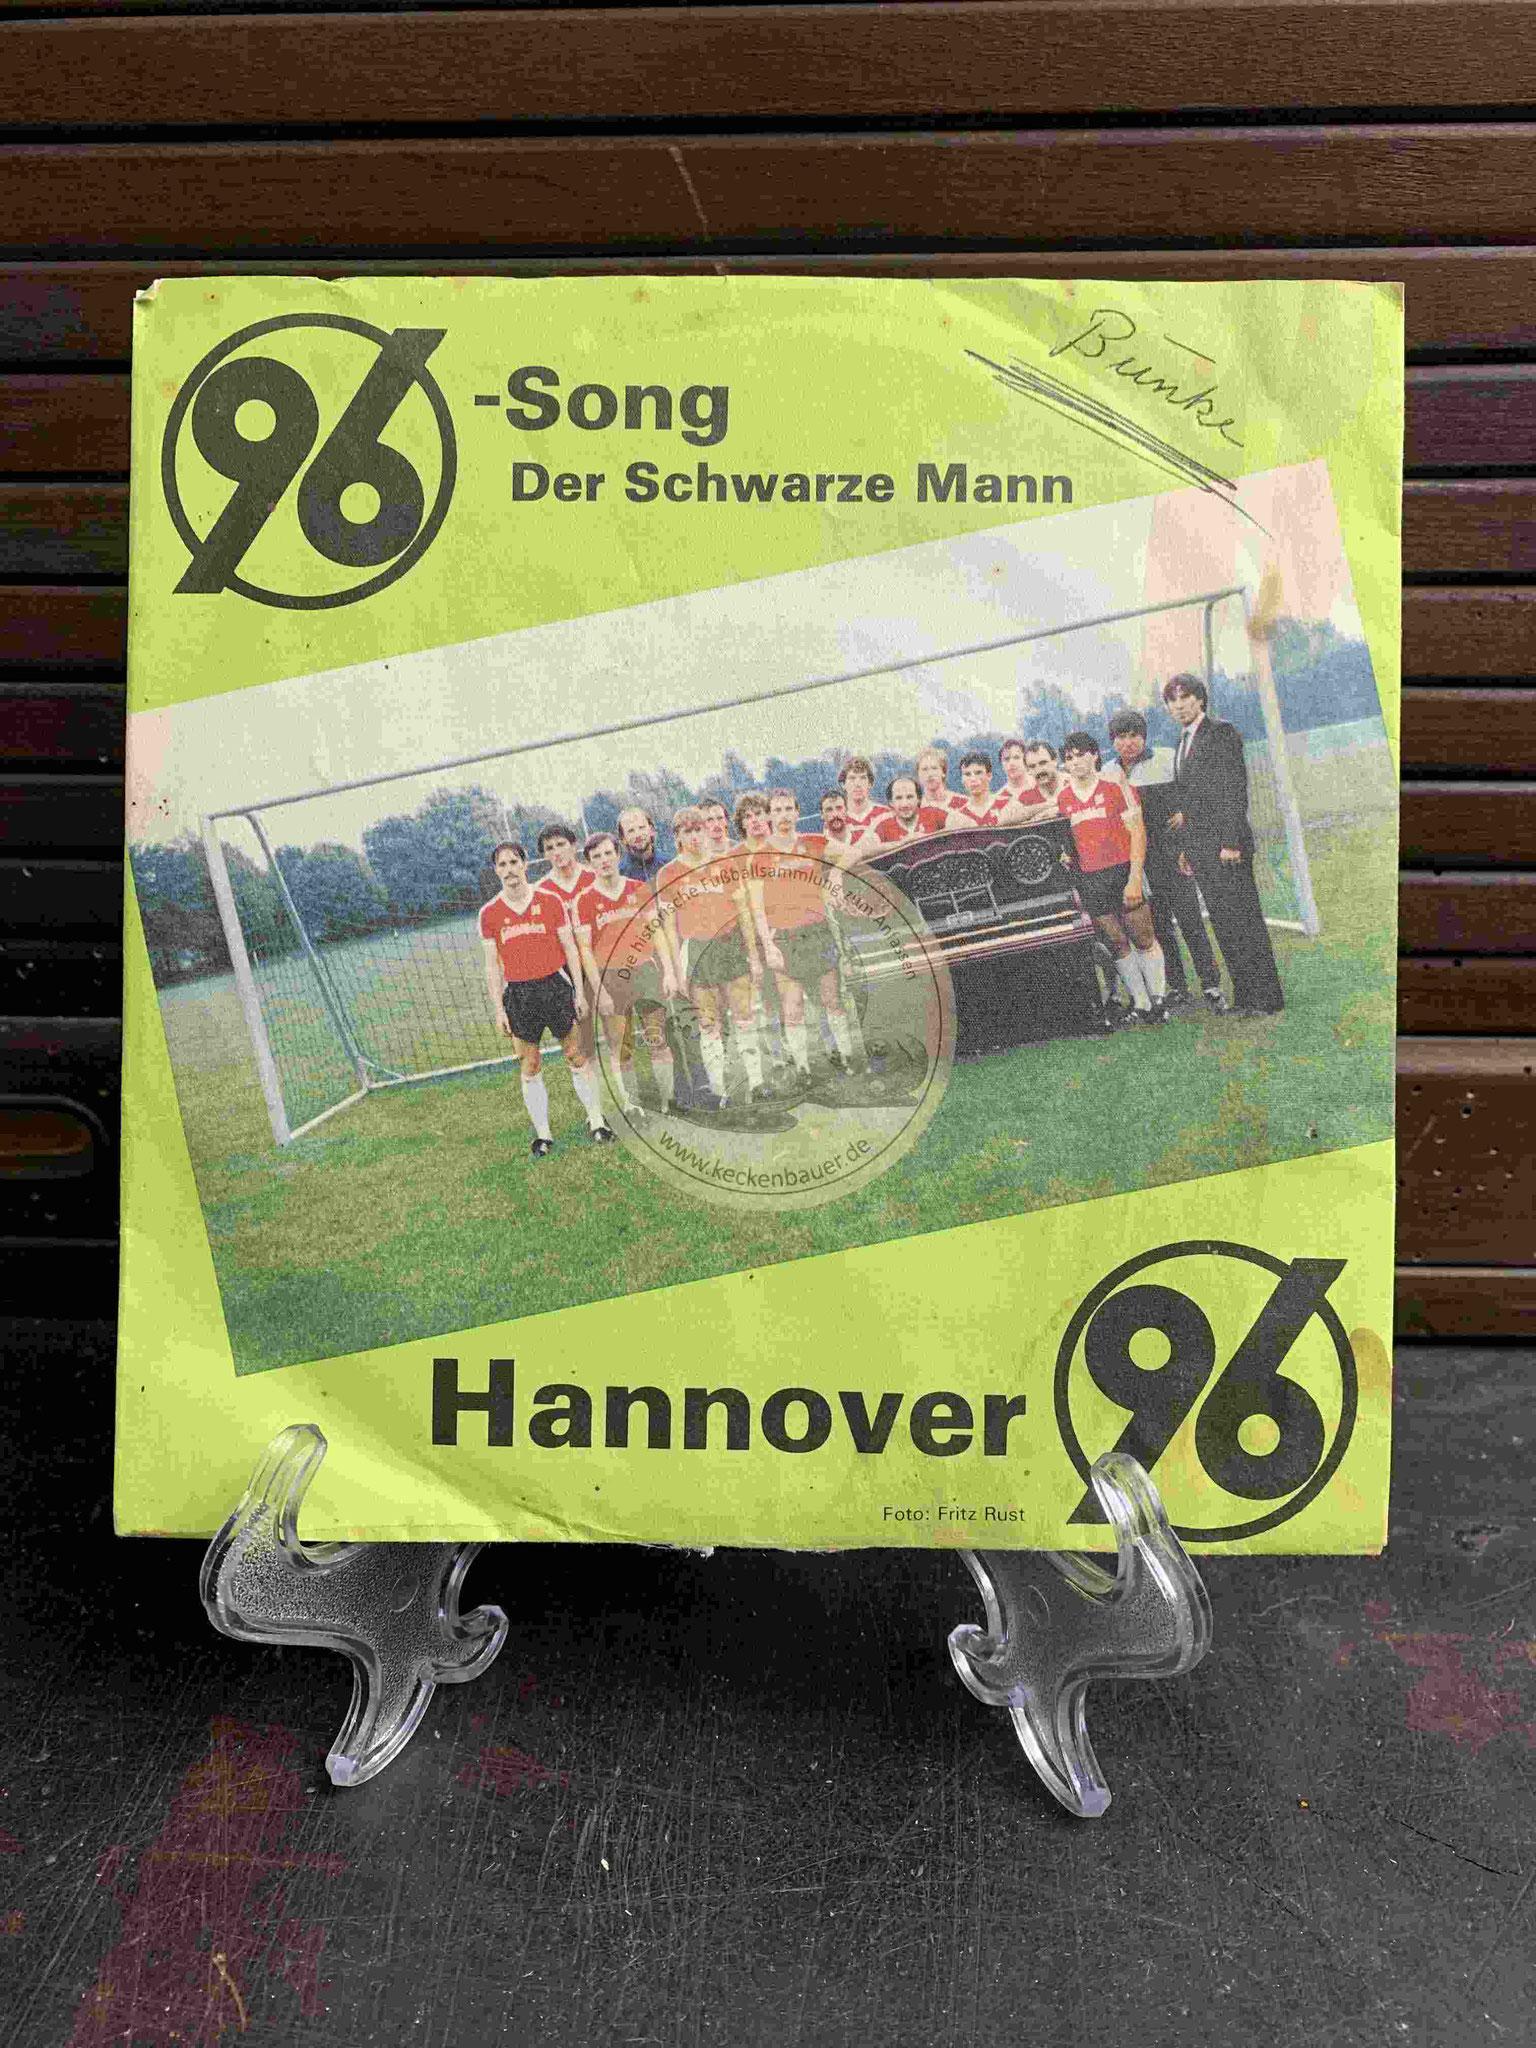 1984 96-Song Der Schwarze Mann Hannover 96